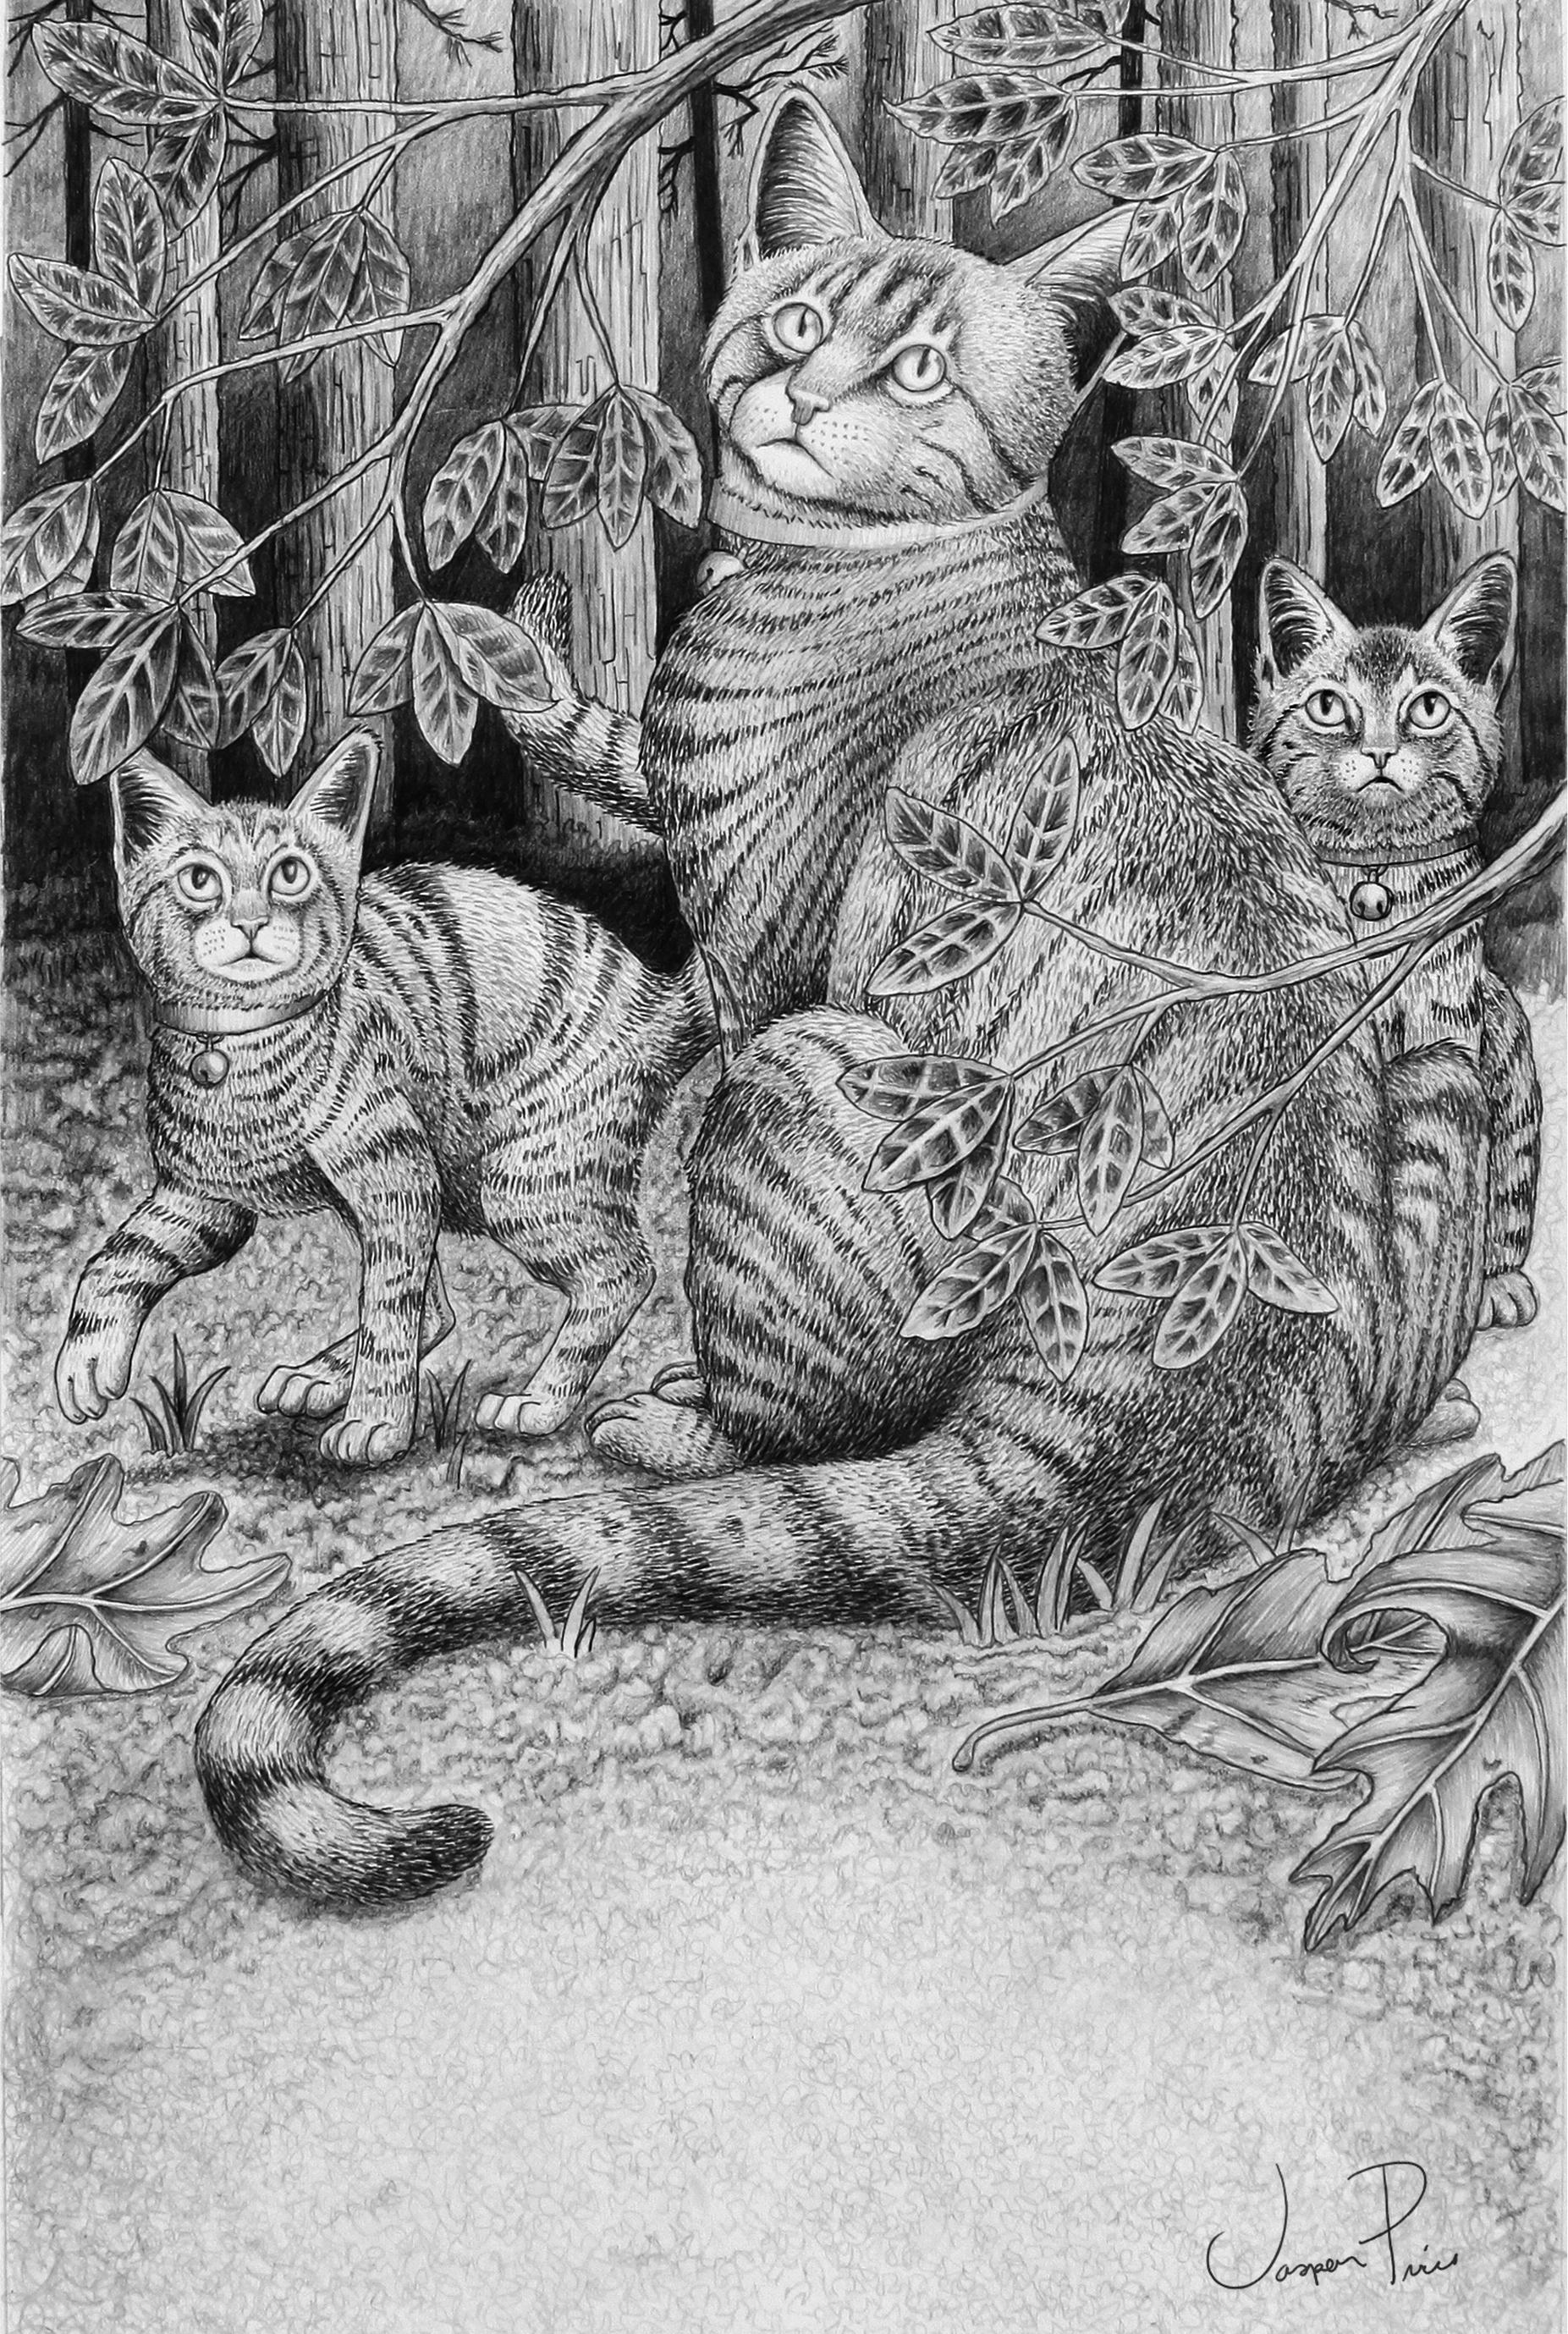 Onyx and Kittens.jpg